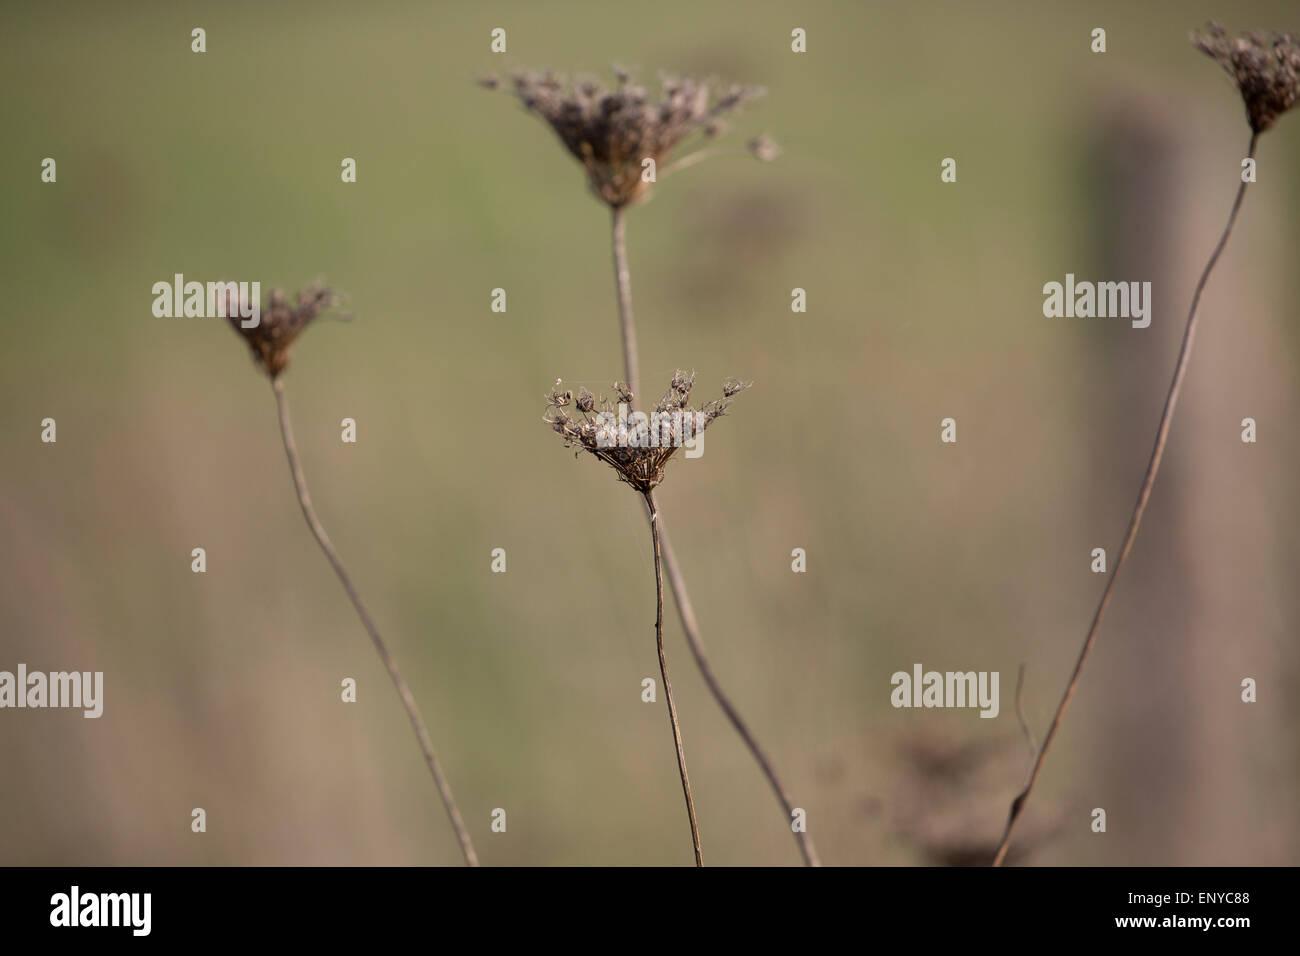 Dry flowers - Stock Image